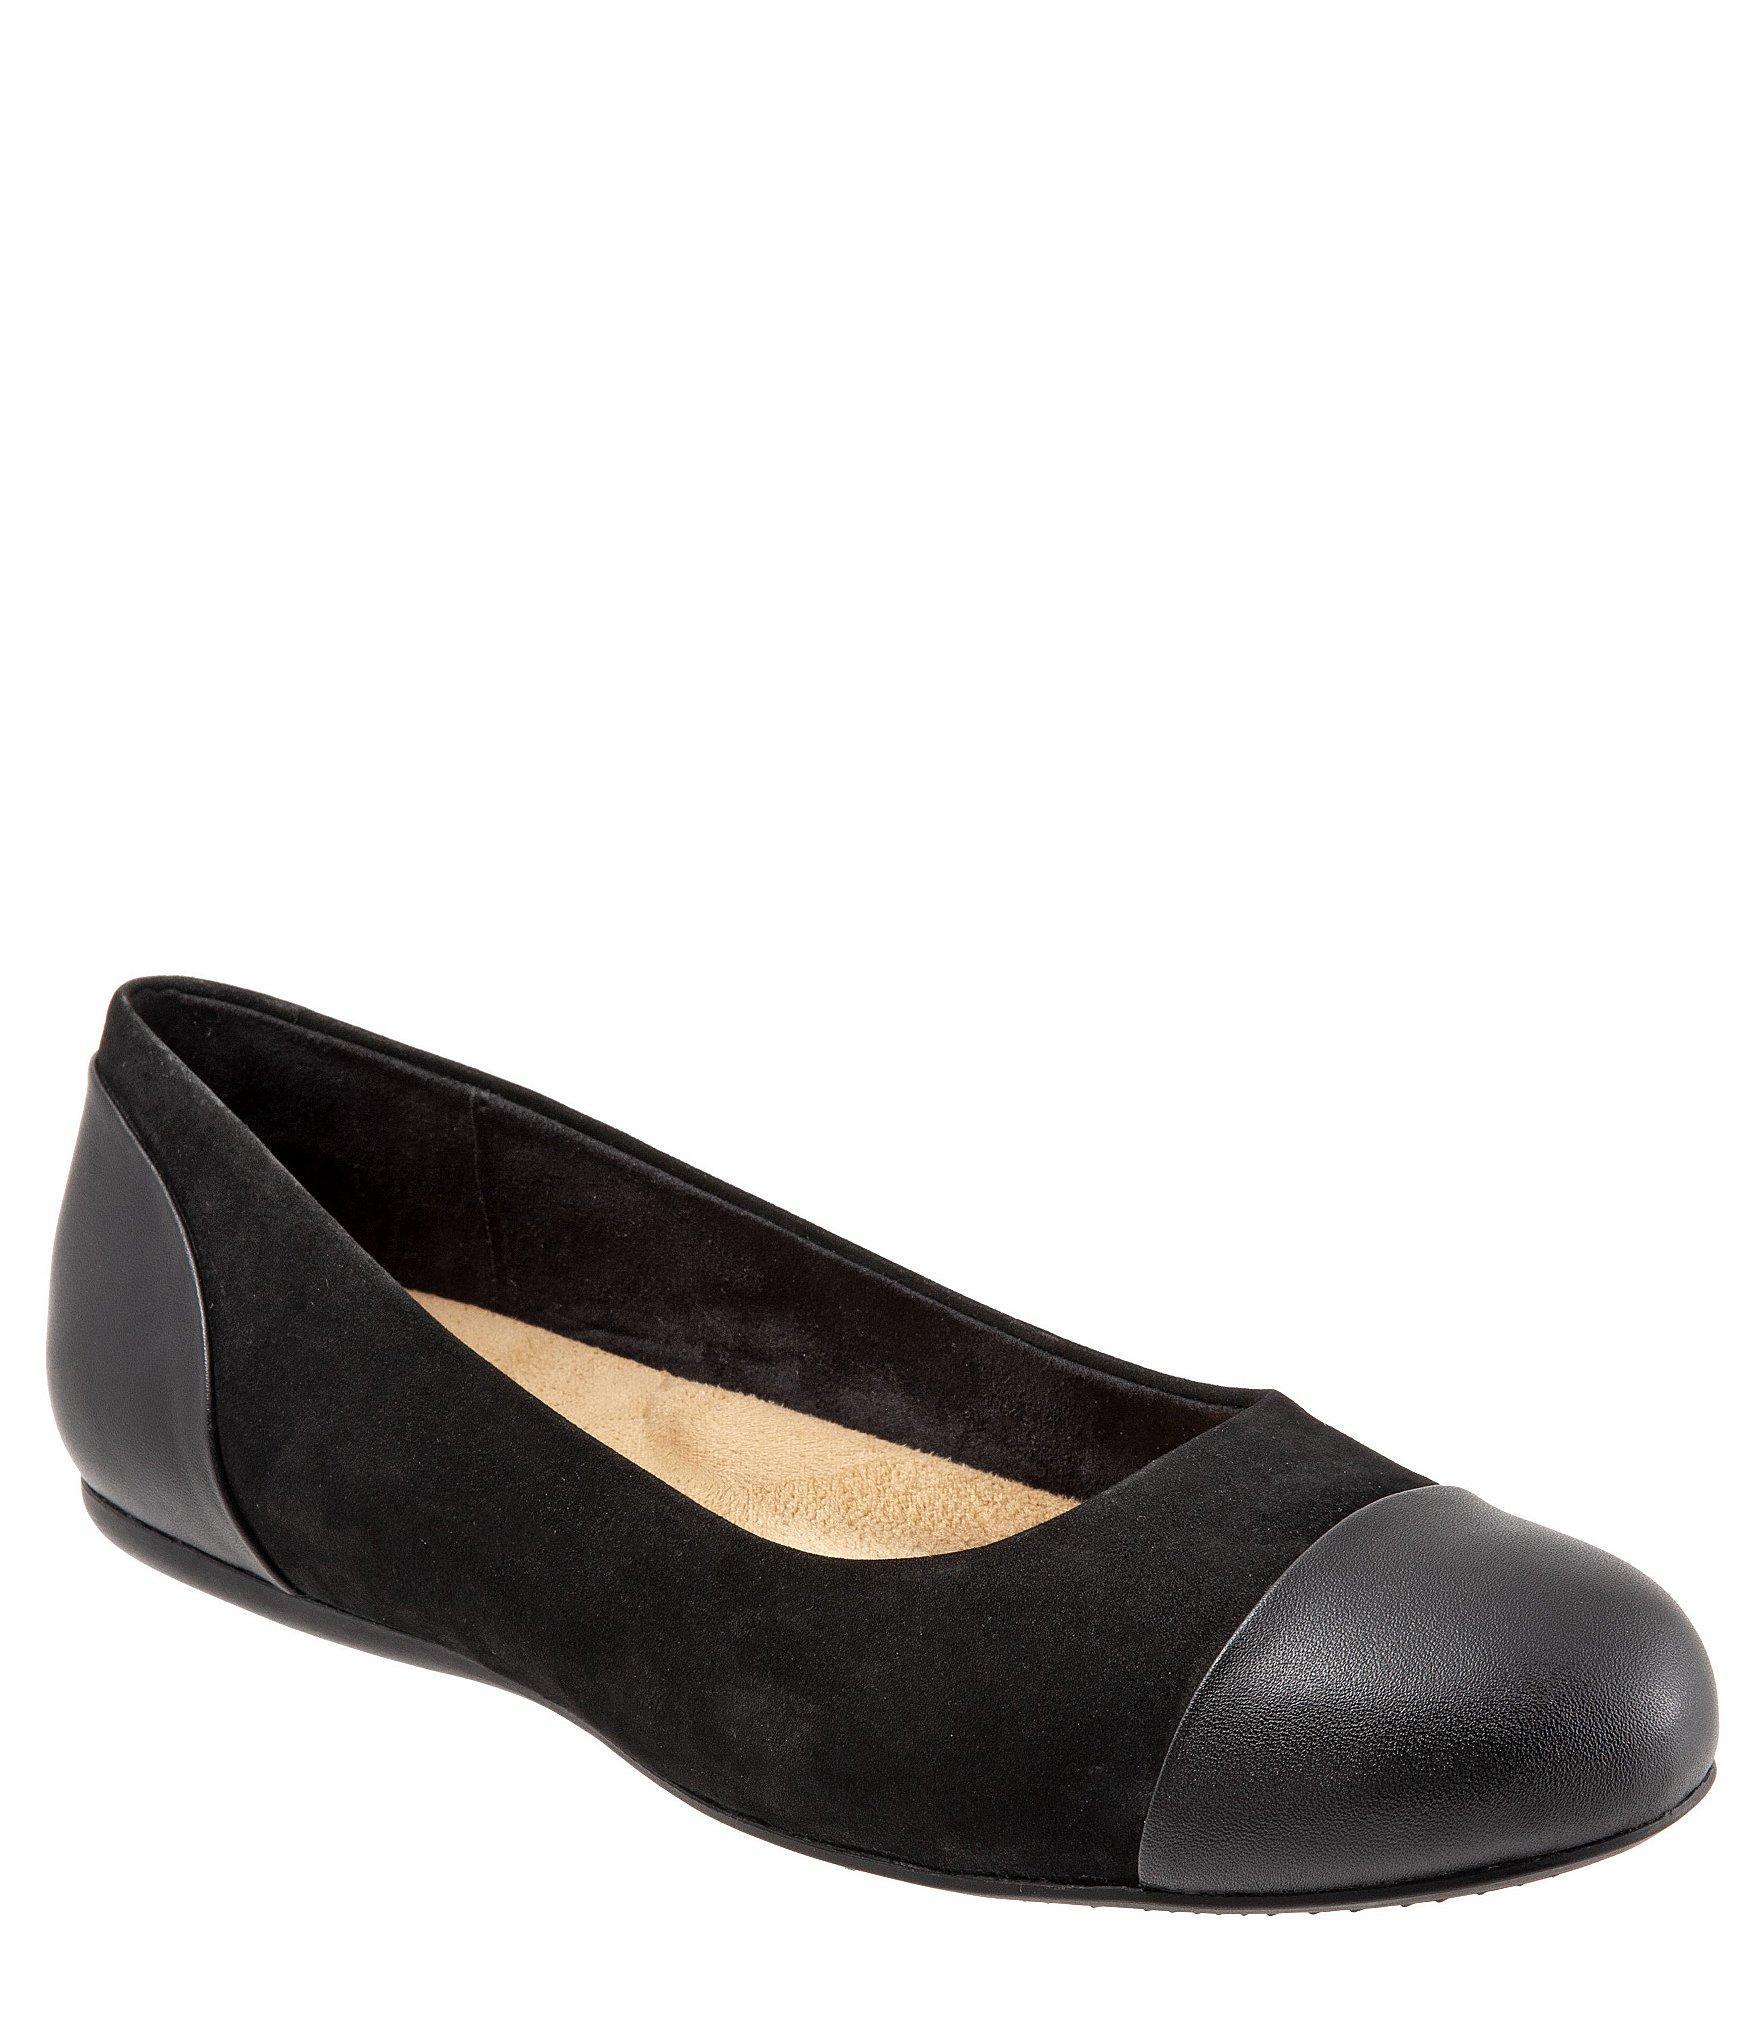 56e8b1f21d0 Lyst - Softwalk® Sonoma Cap Toe Nubuck Ballet Flats in Black